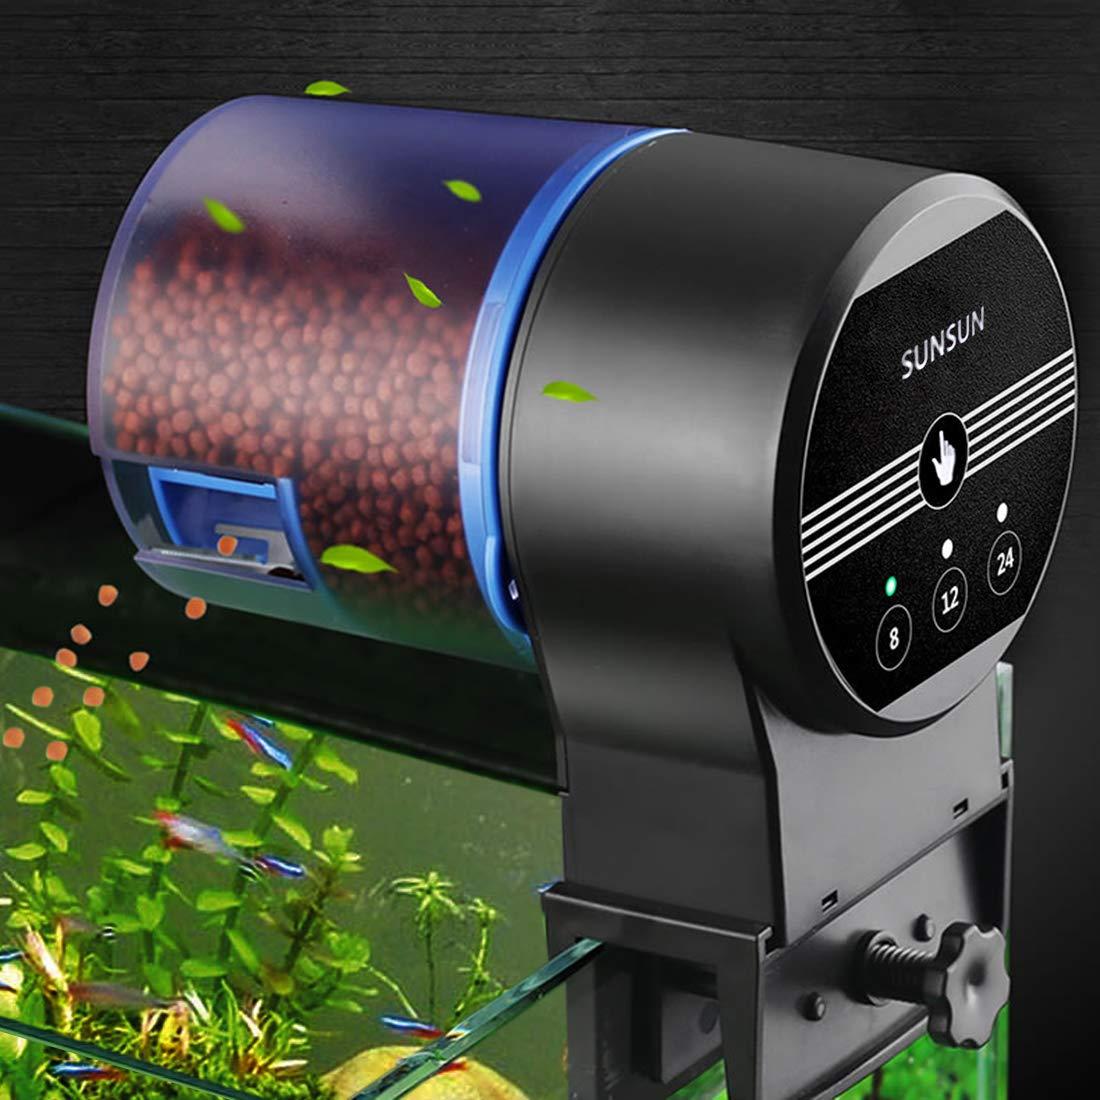 Iseebiz Automatic Tank Feeder Koi Goldfish Feeder Aquariums Moisture-Proof Intelligent Timing Feeding Machine, 2 Fish Food Dispenser. by Iseebiz (Image #1)